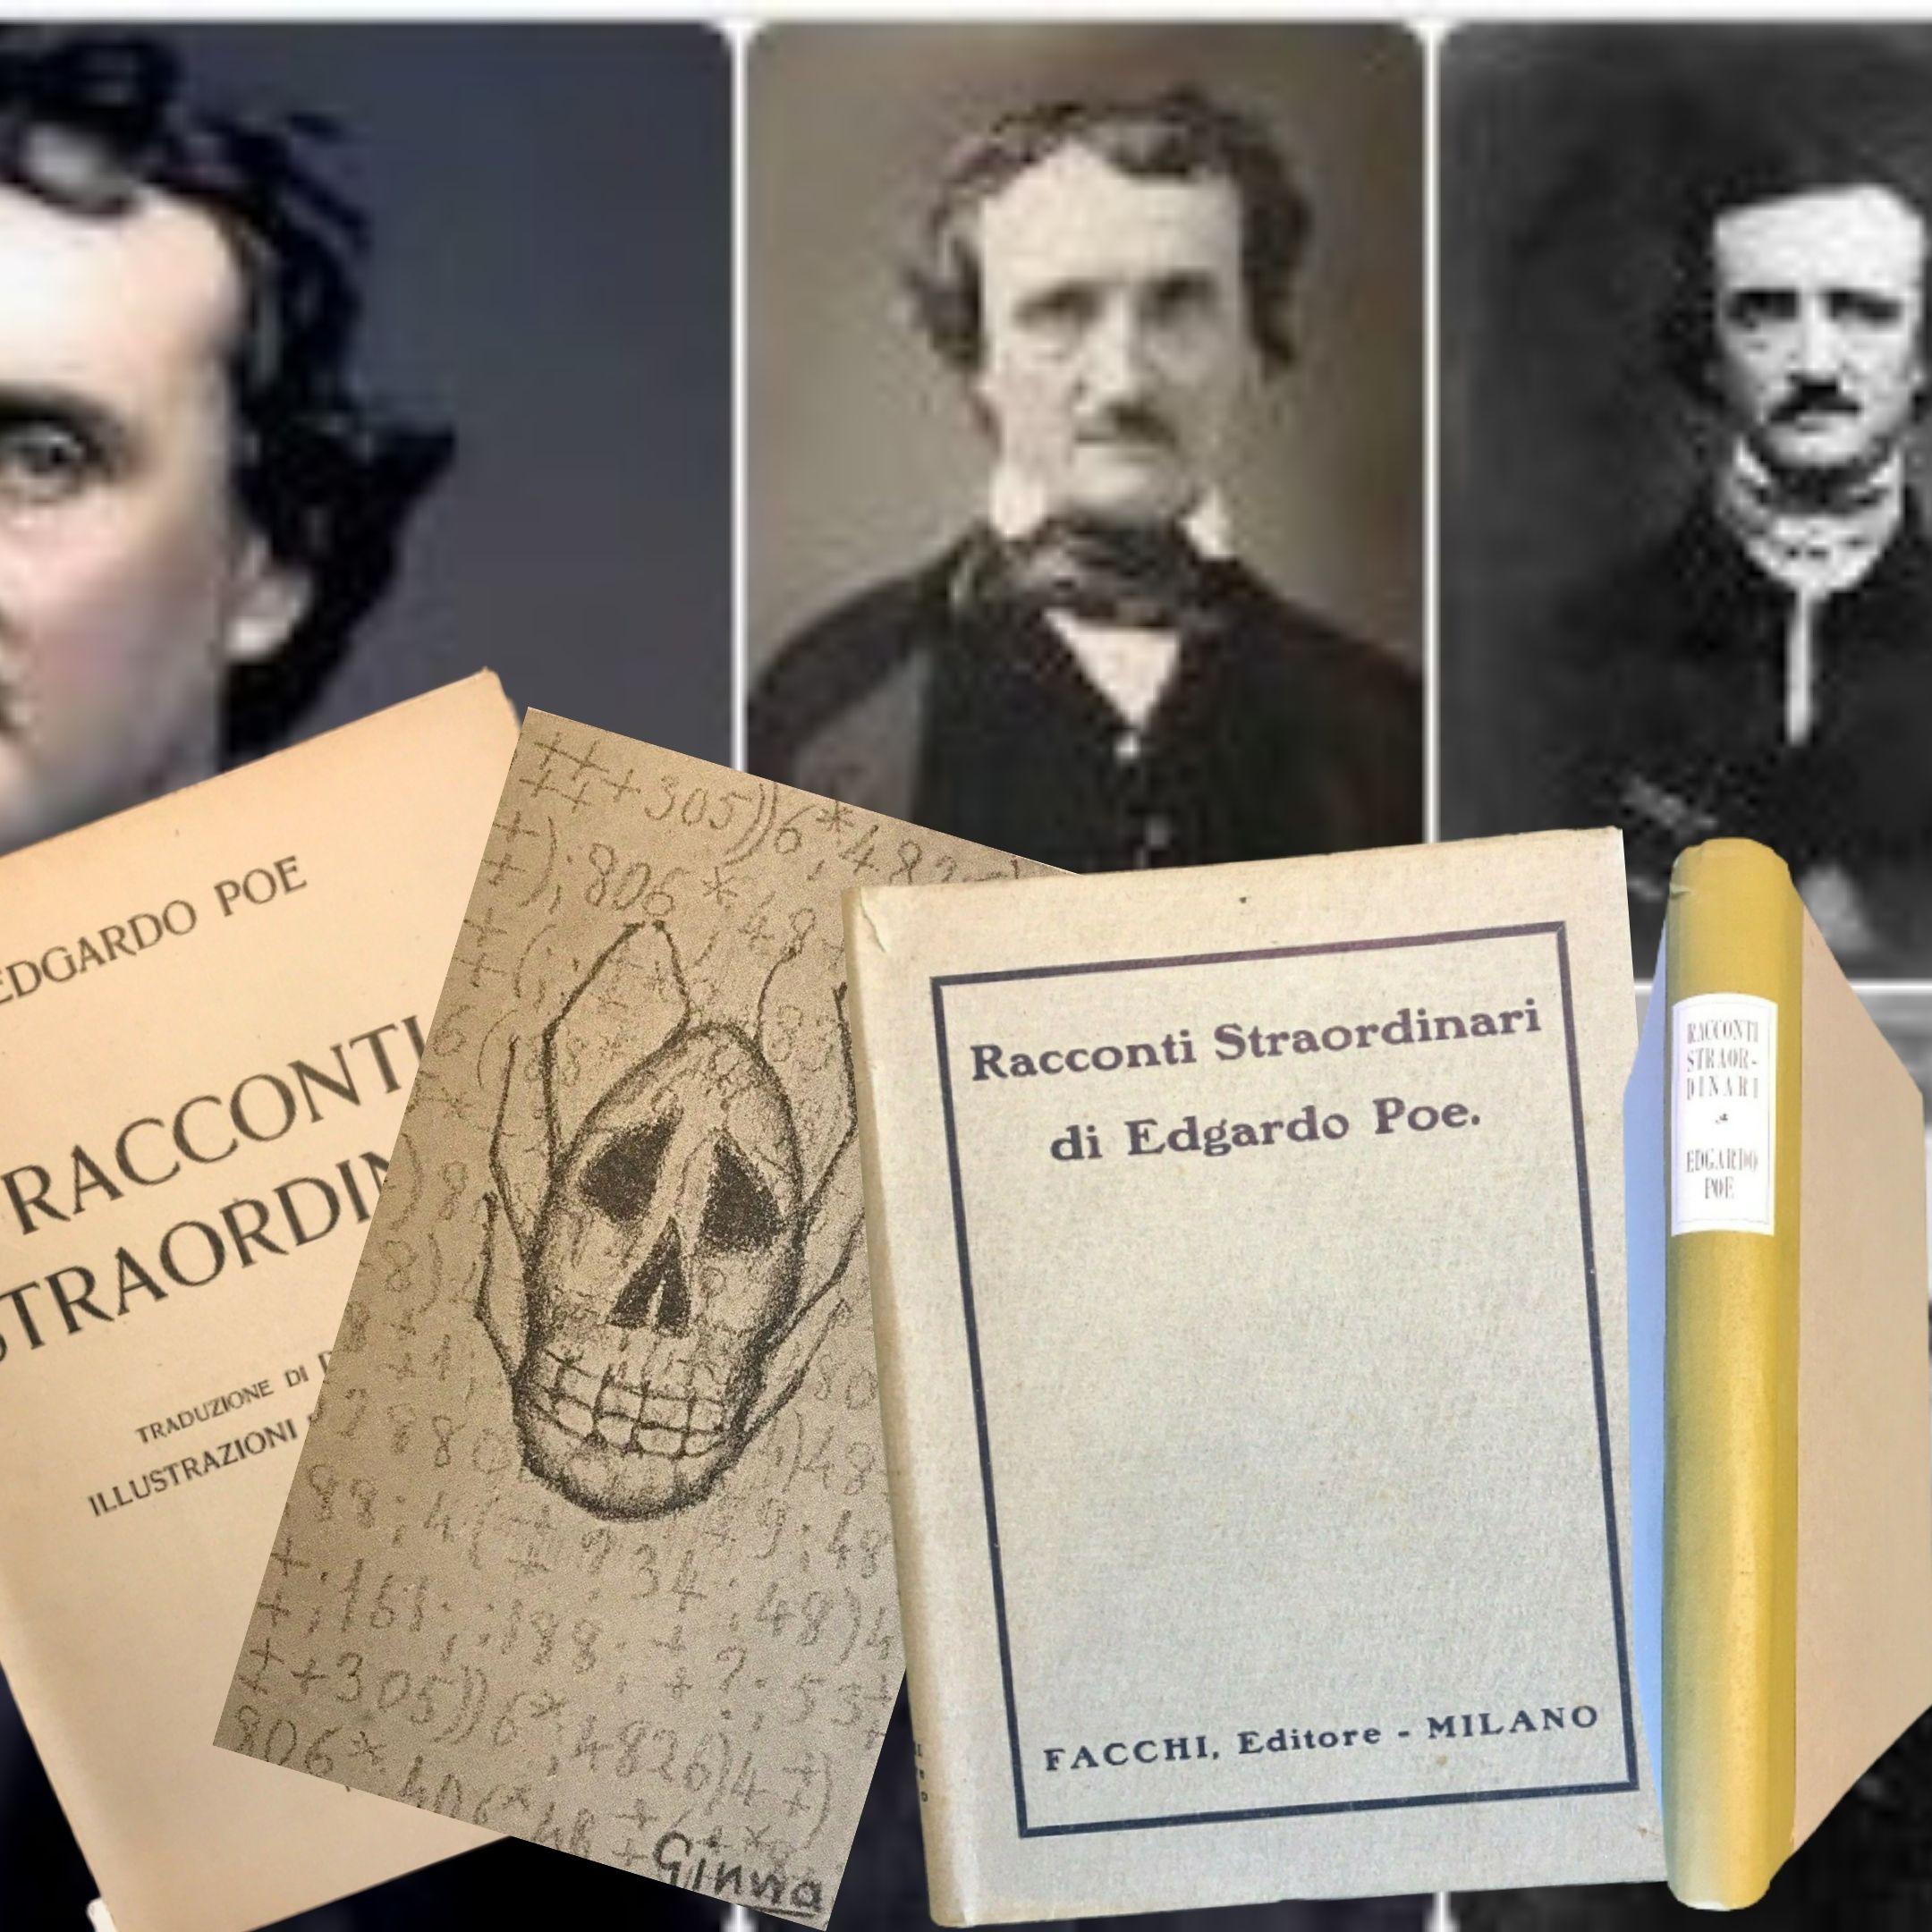 """Racconti straordinari"" di Edgardo Poe illustrati dal futurista Arnaldo Ginna"